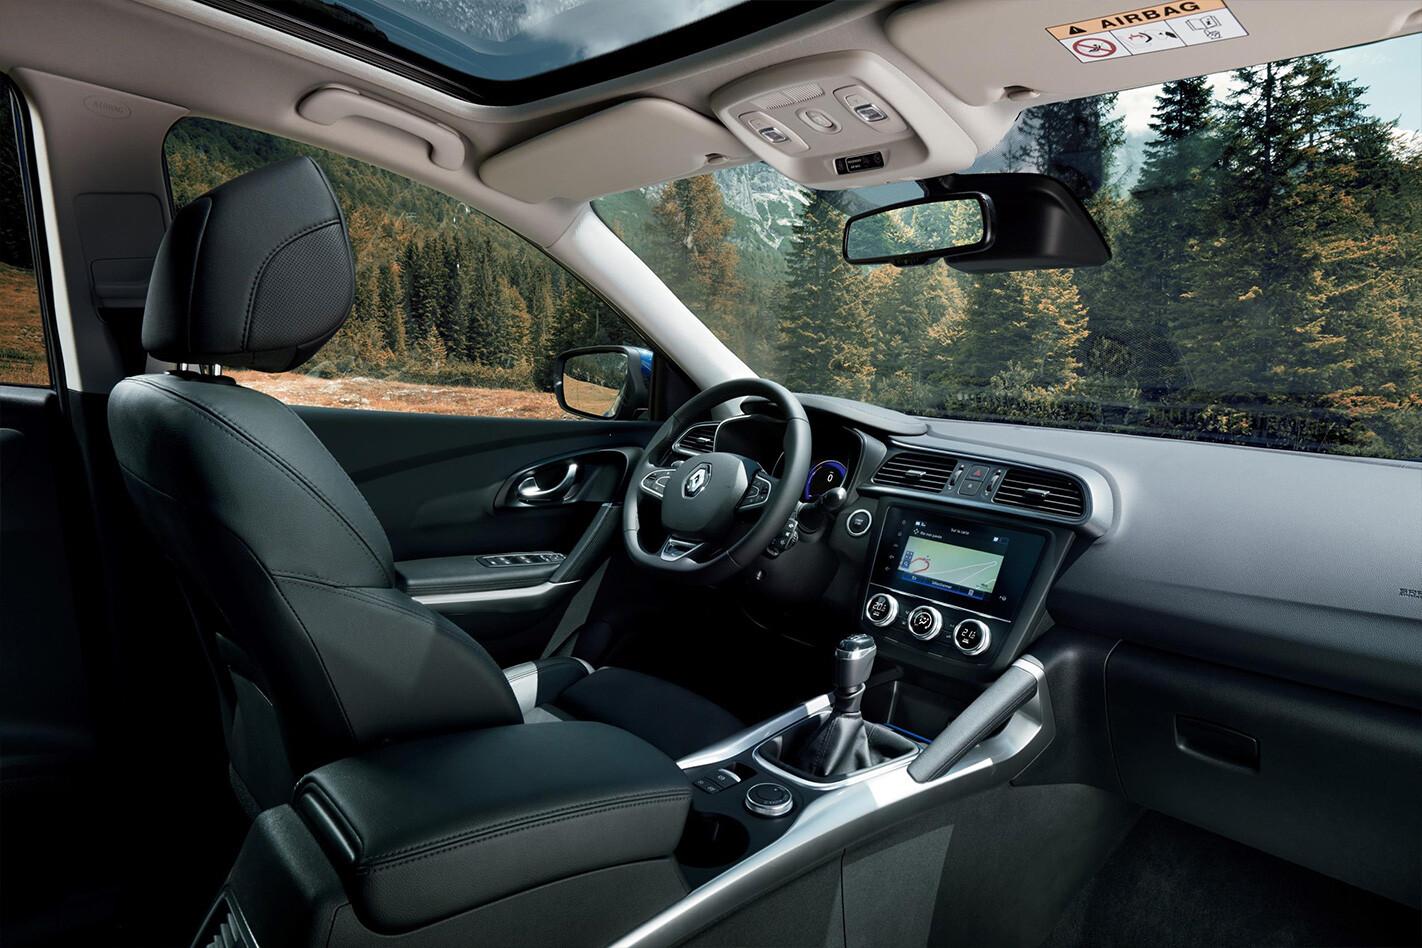 Renault Kadjar Interior Jpg